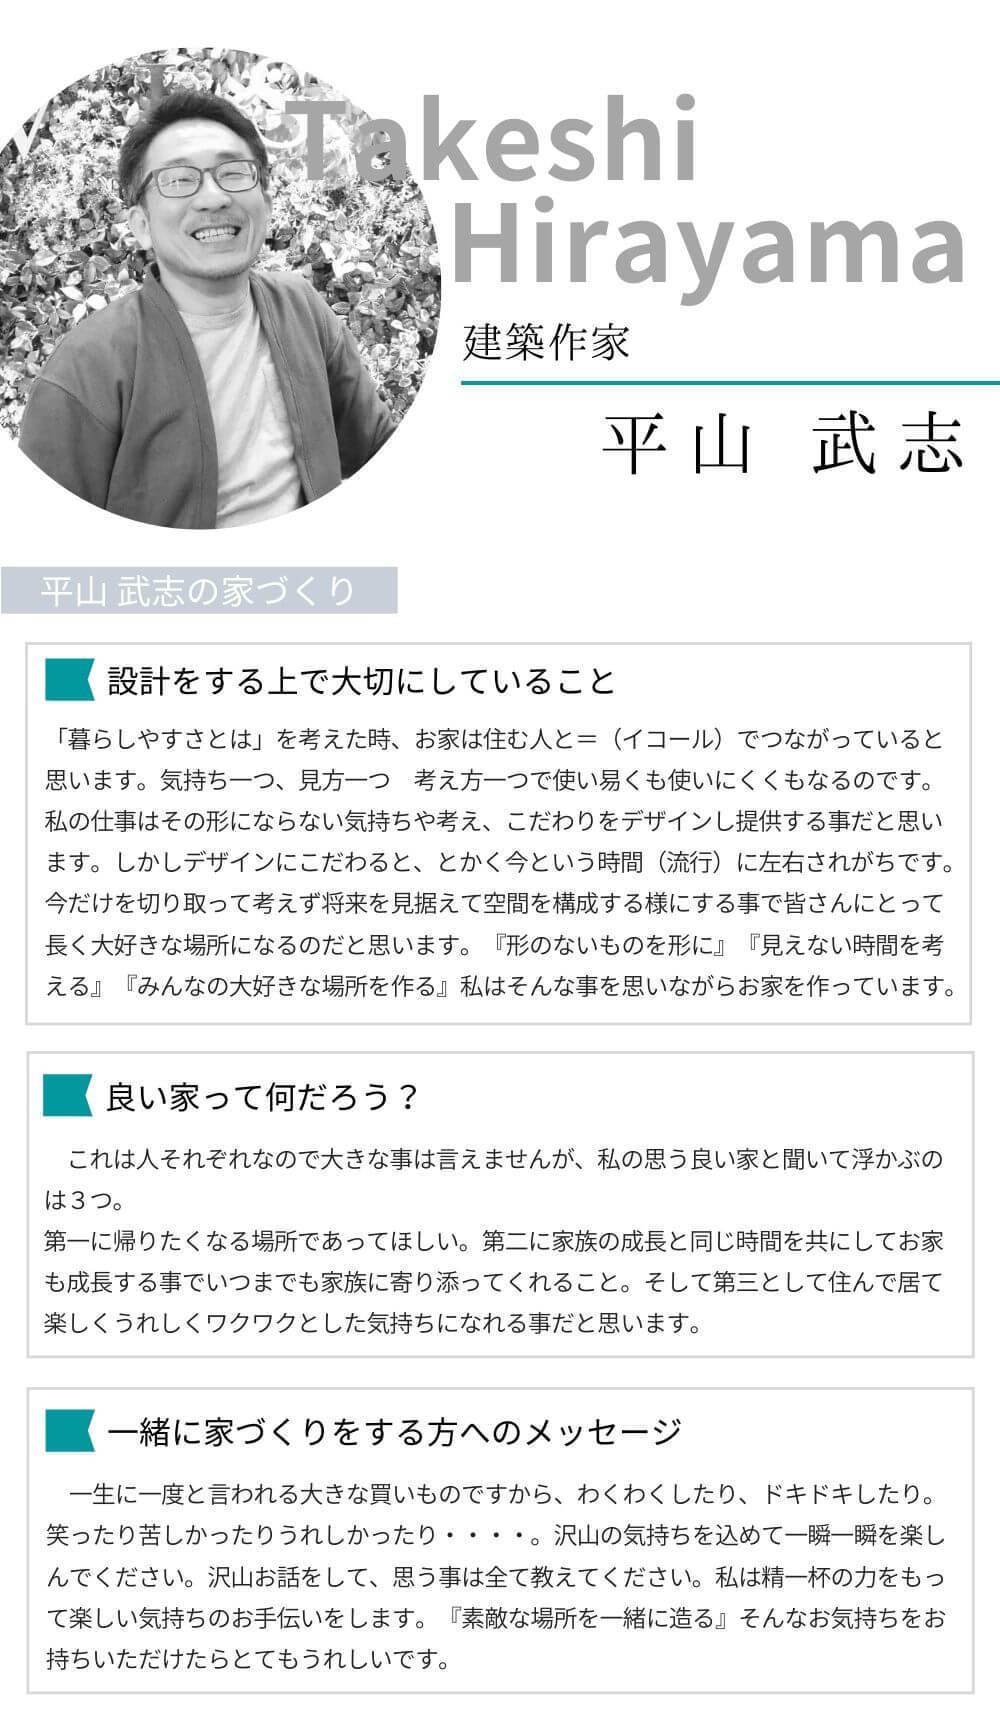 VISIO飯山満Ⅴ│建築作家